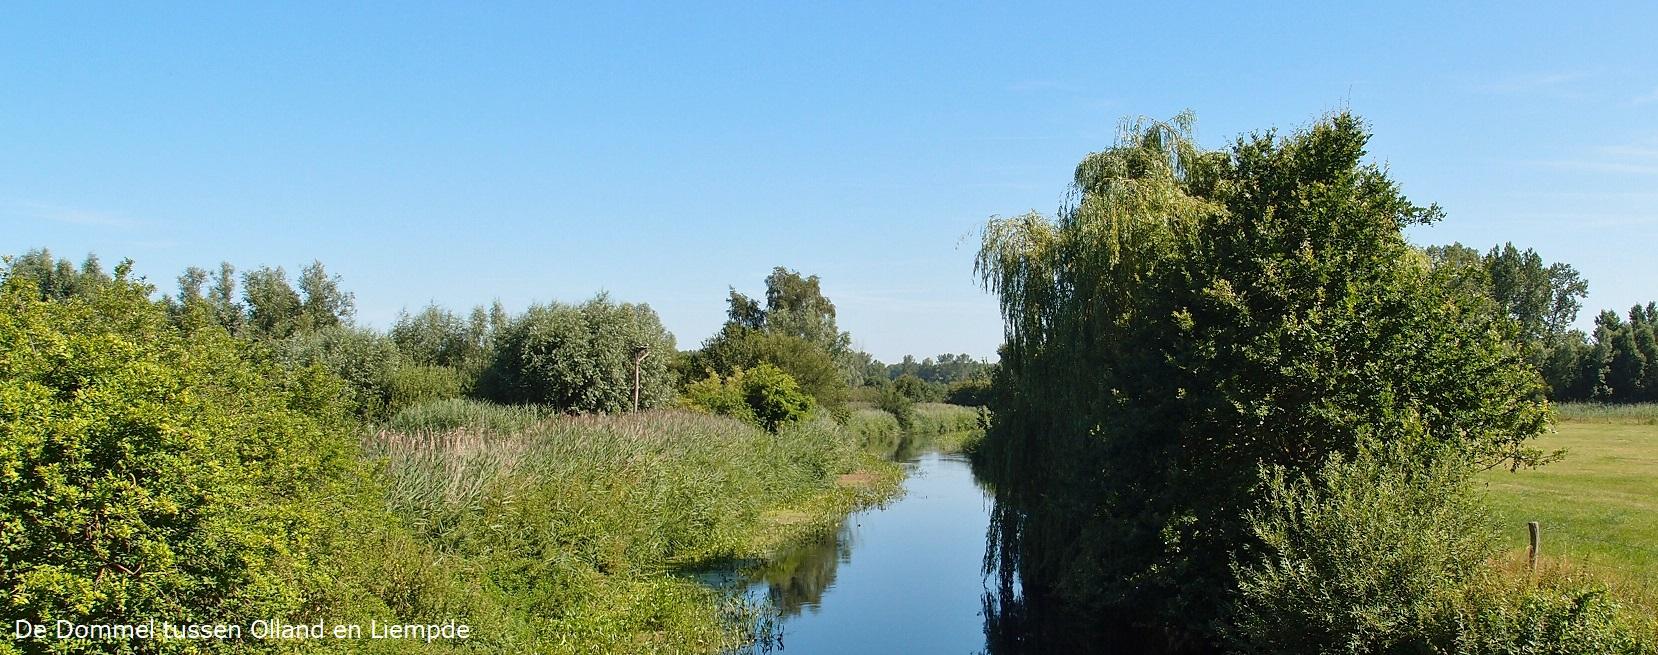 Dommeldal tussen Olland en Liempde